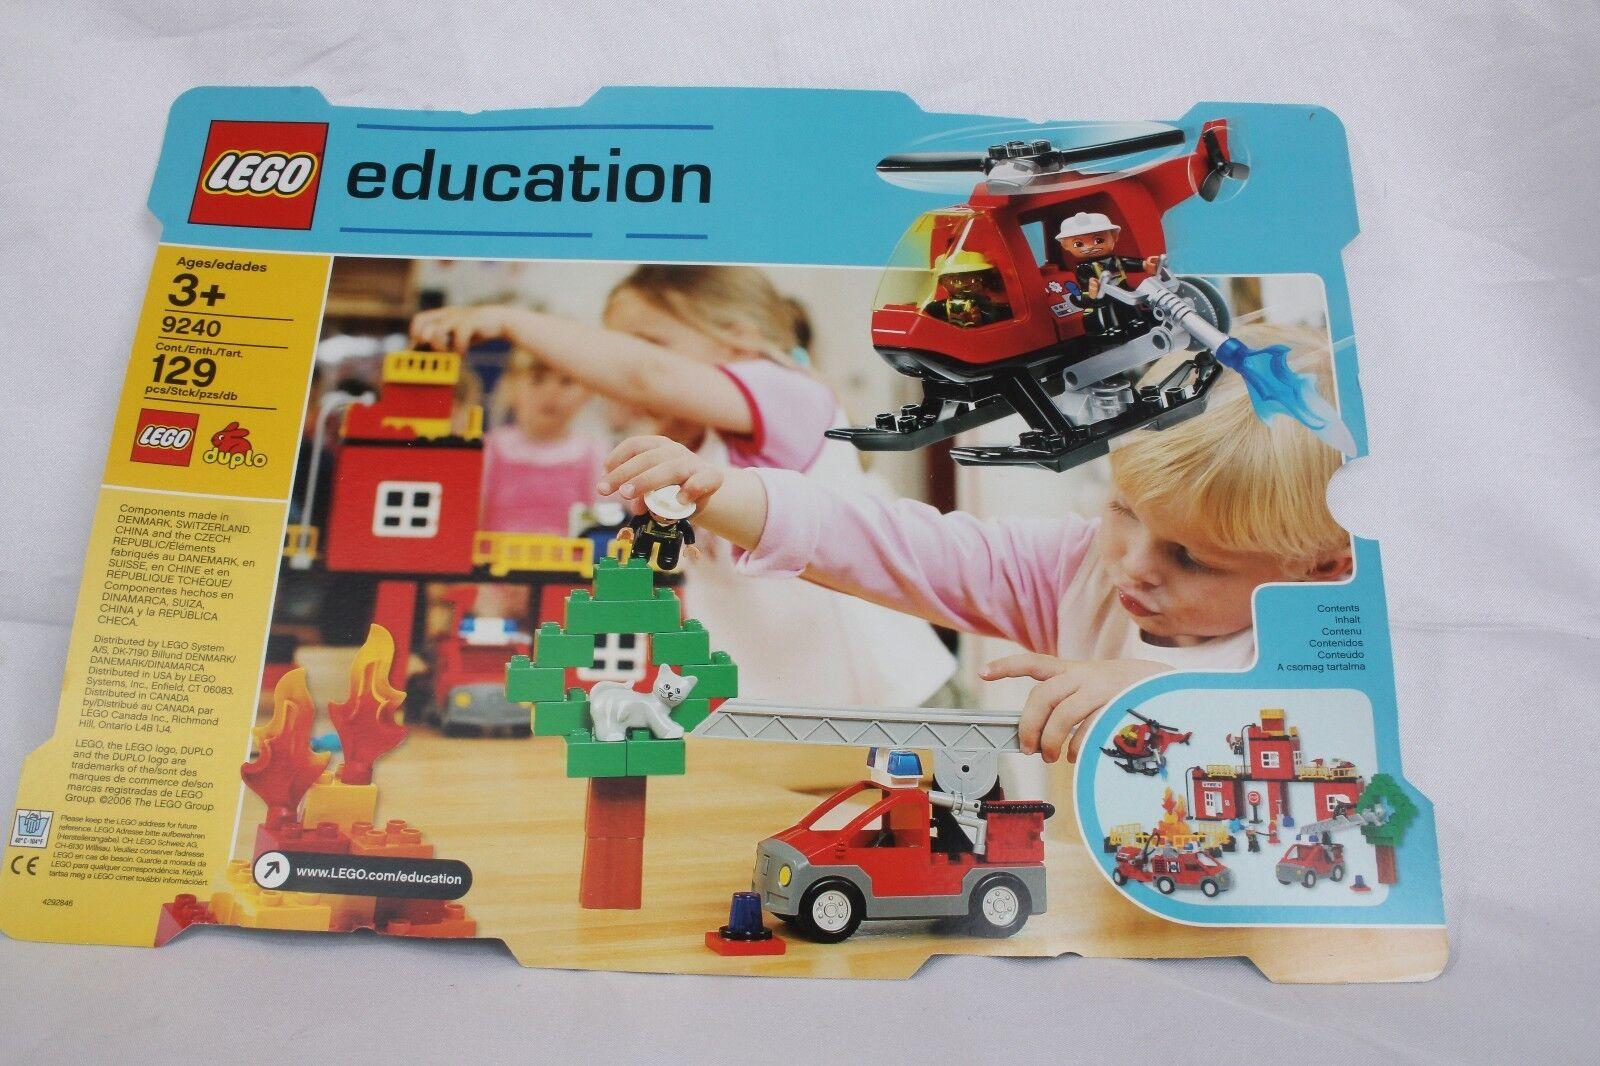 NIB Lego Education Fire Station Fire Rescue Services Set 129 Pieces  9240